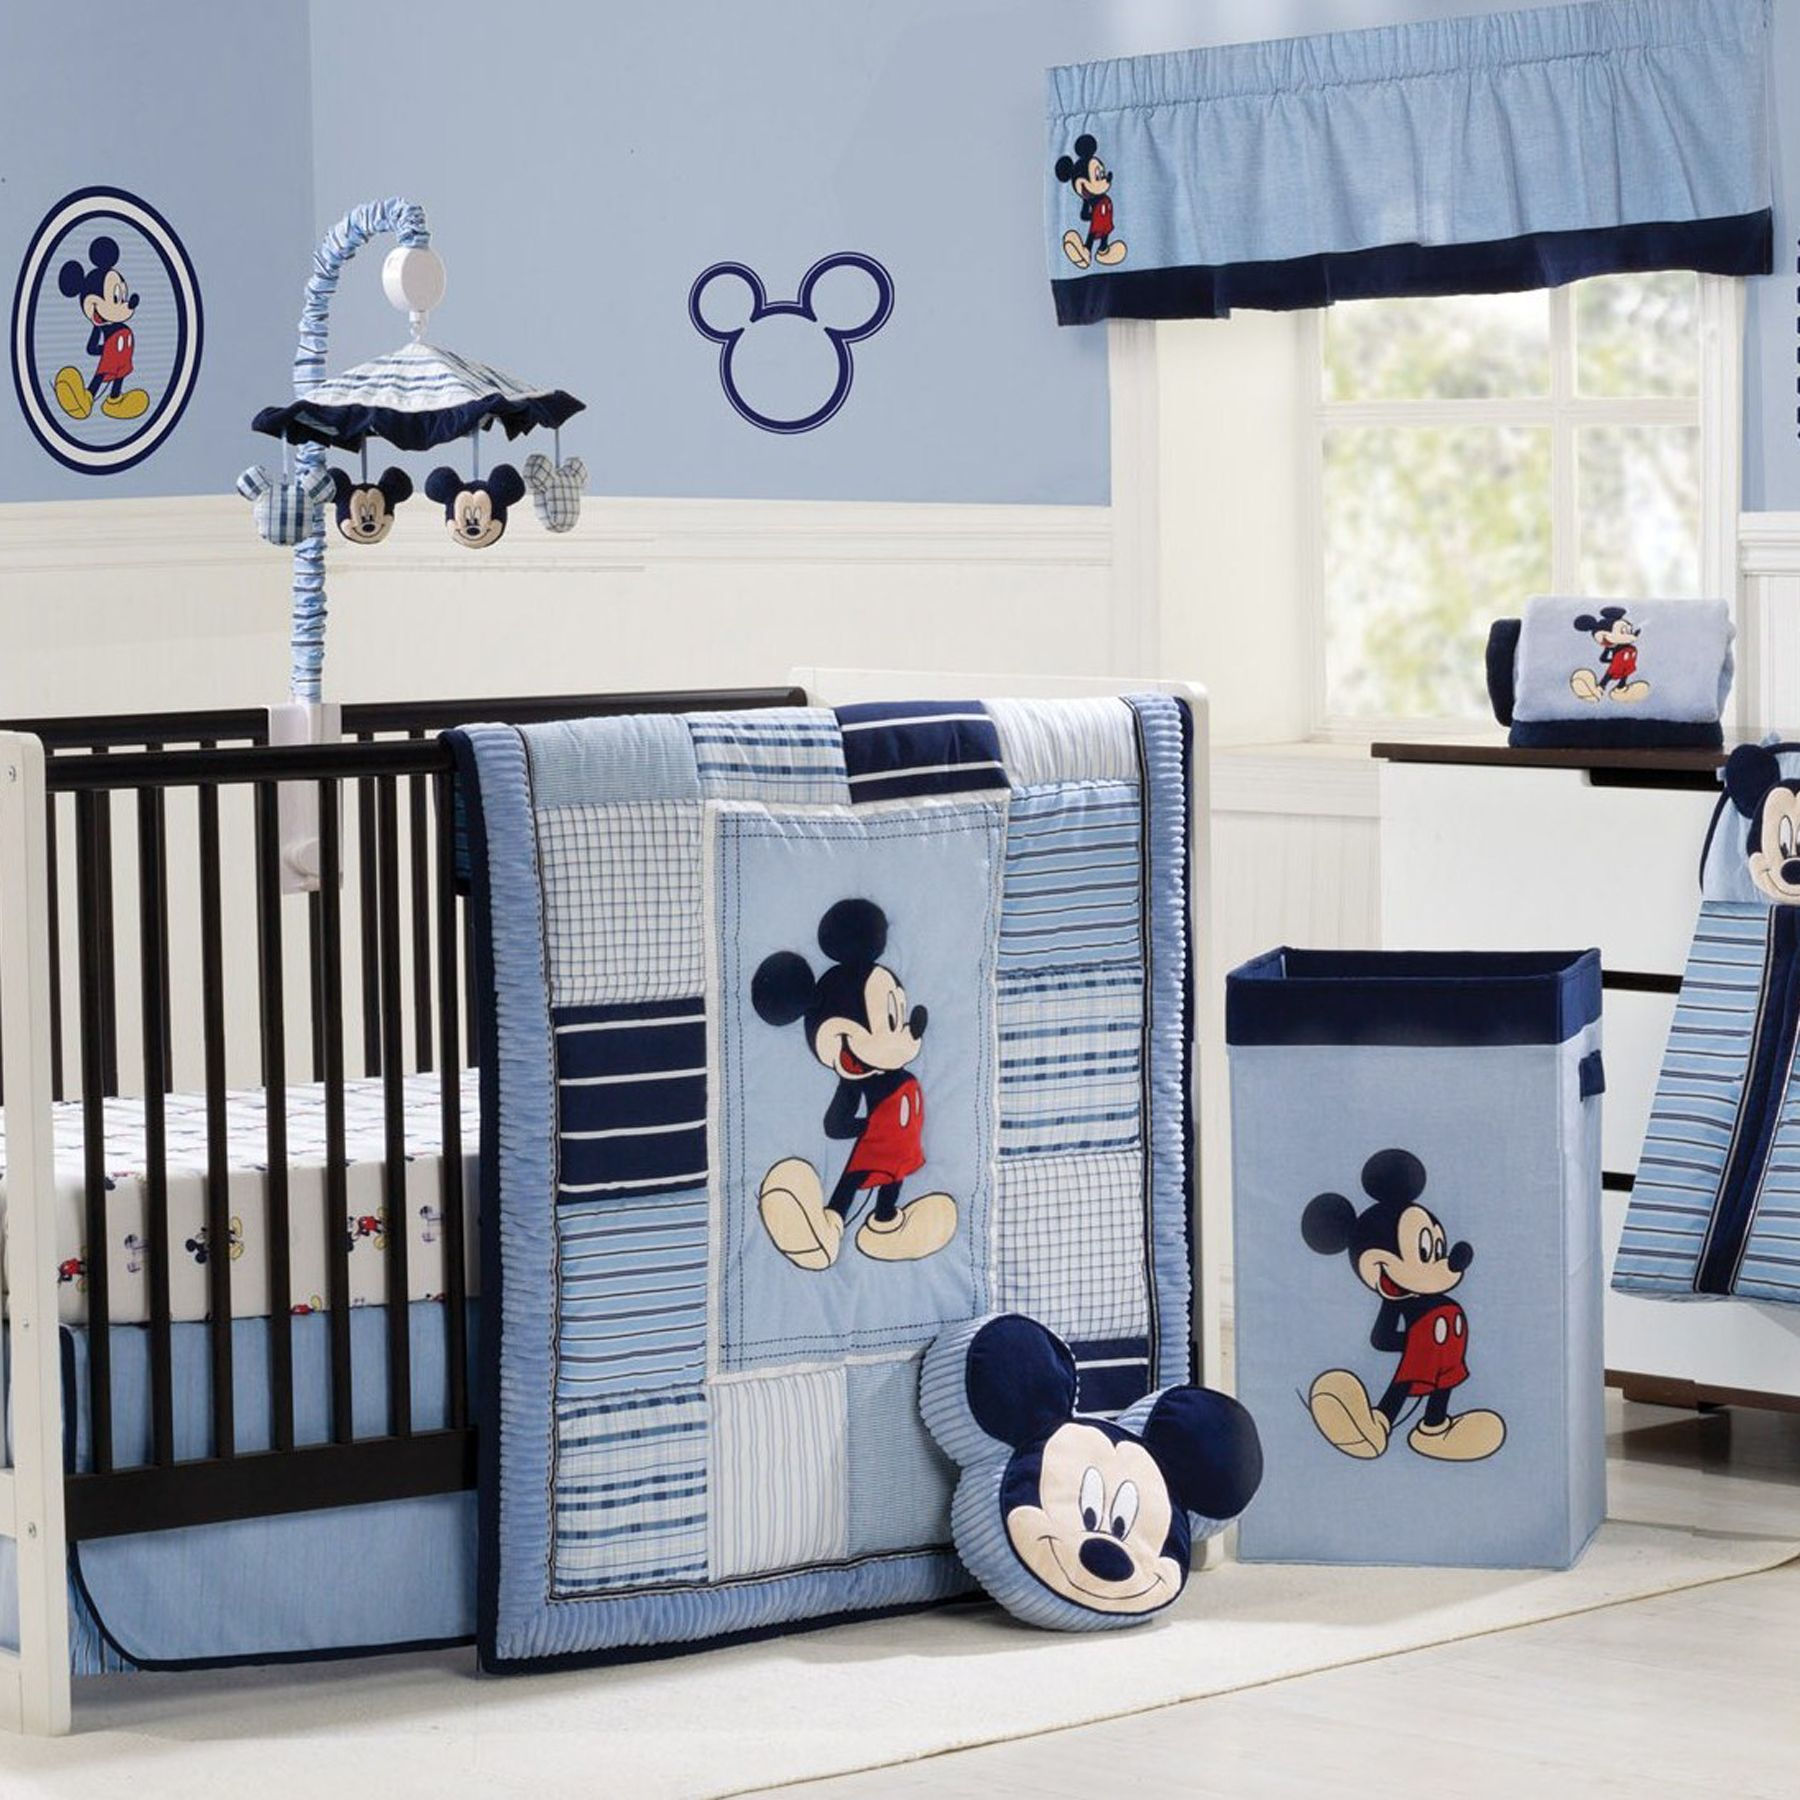 Kinderzimmer Dekor Sets Dschungel Kinderbett Betten Kinderzimmer